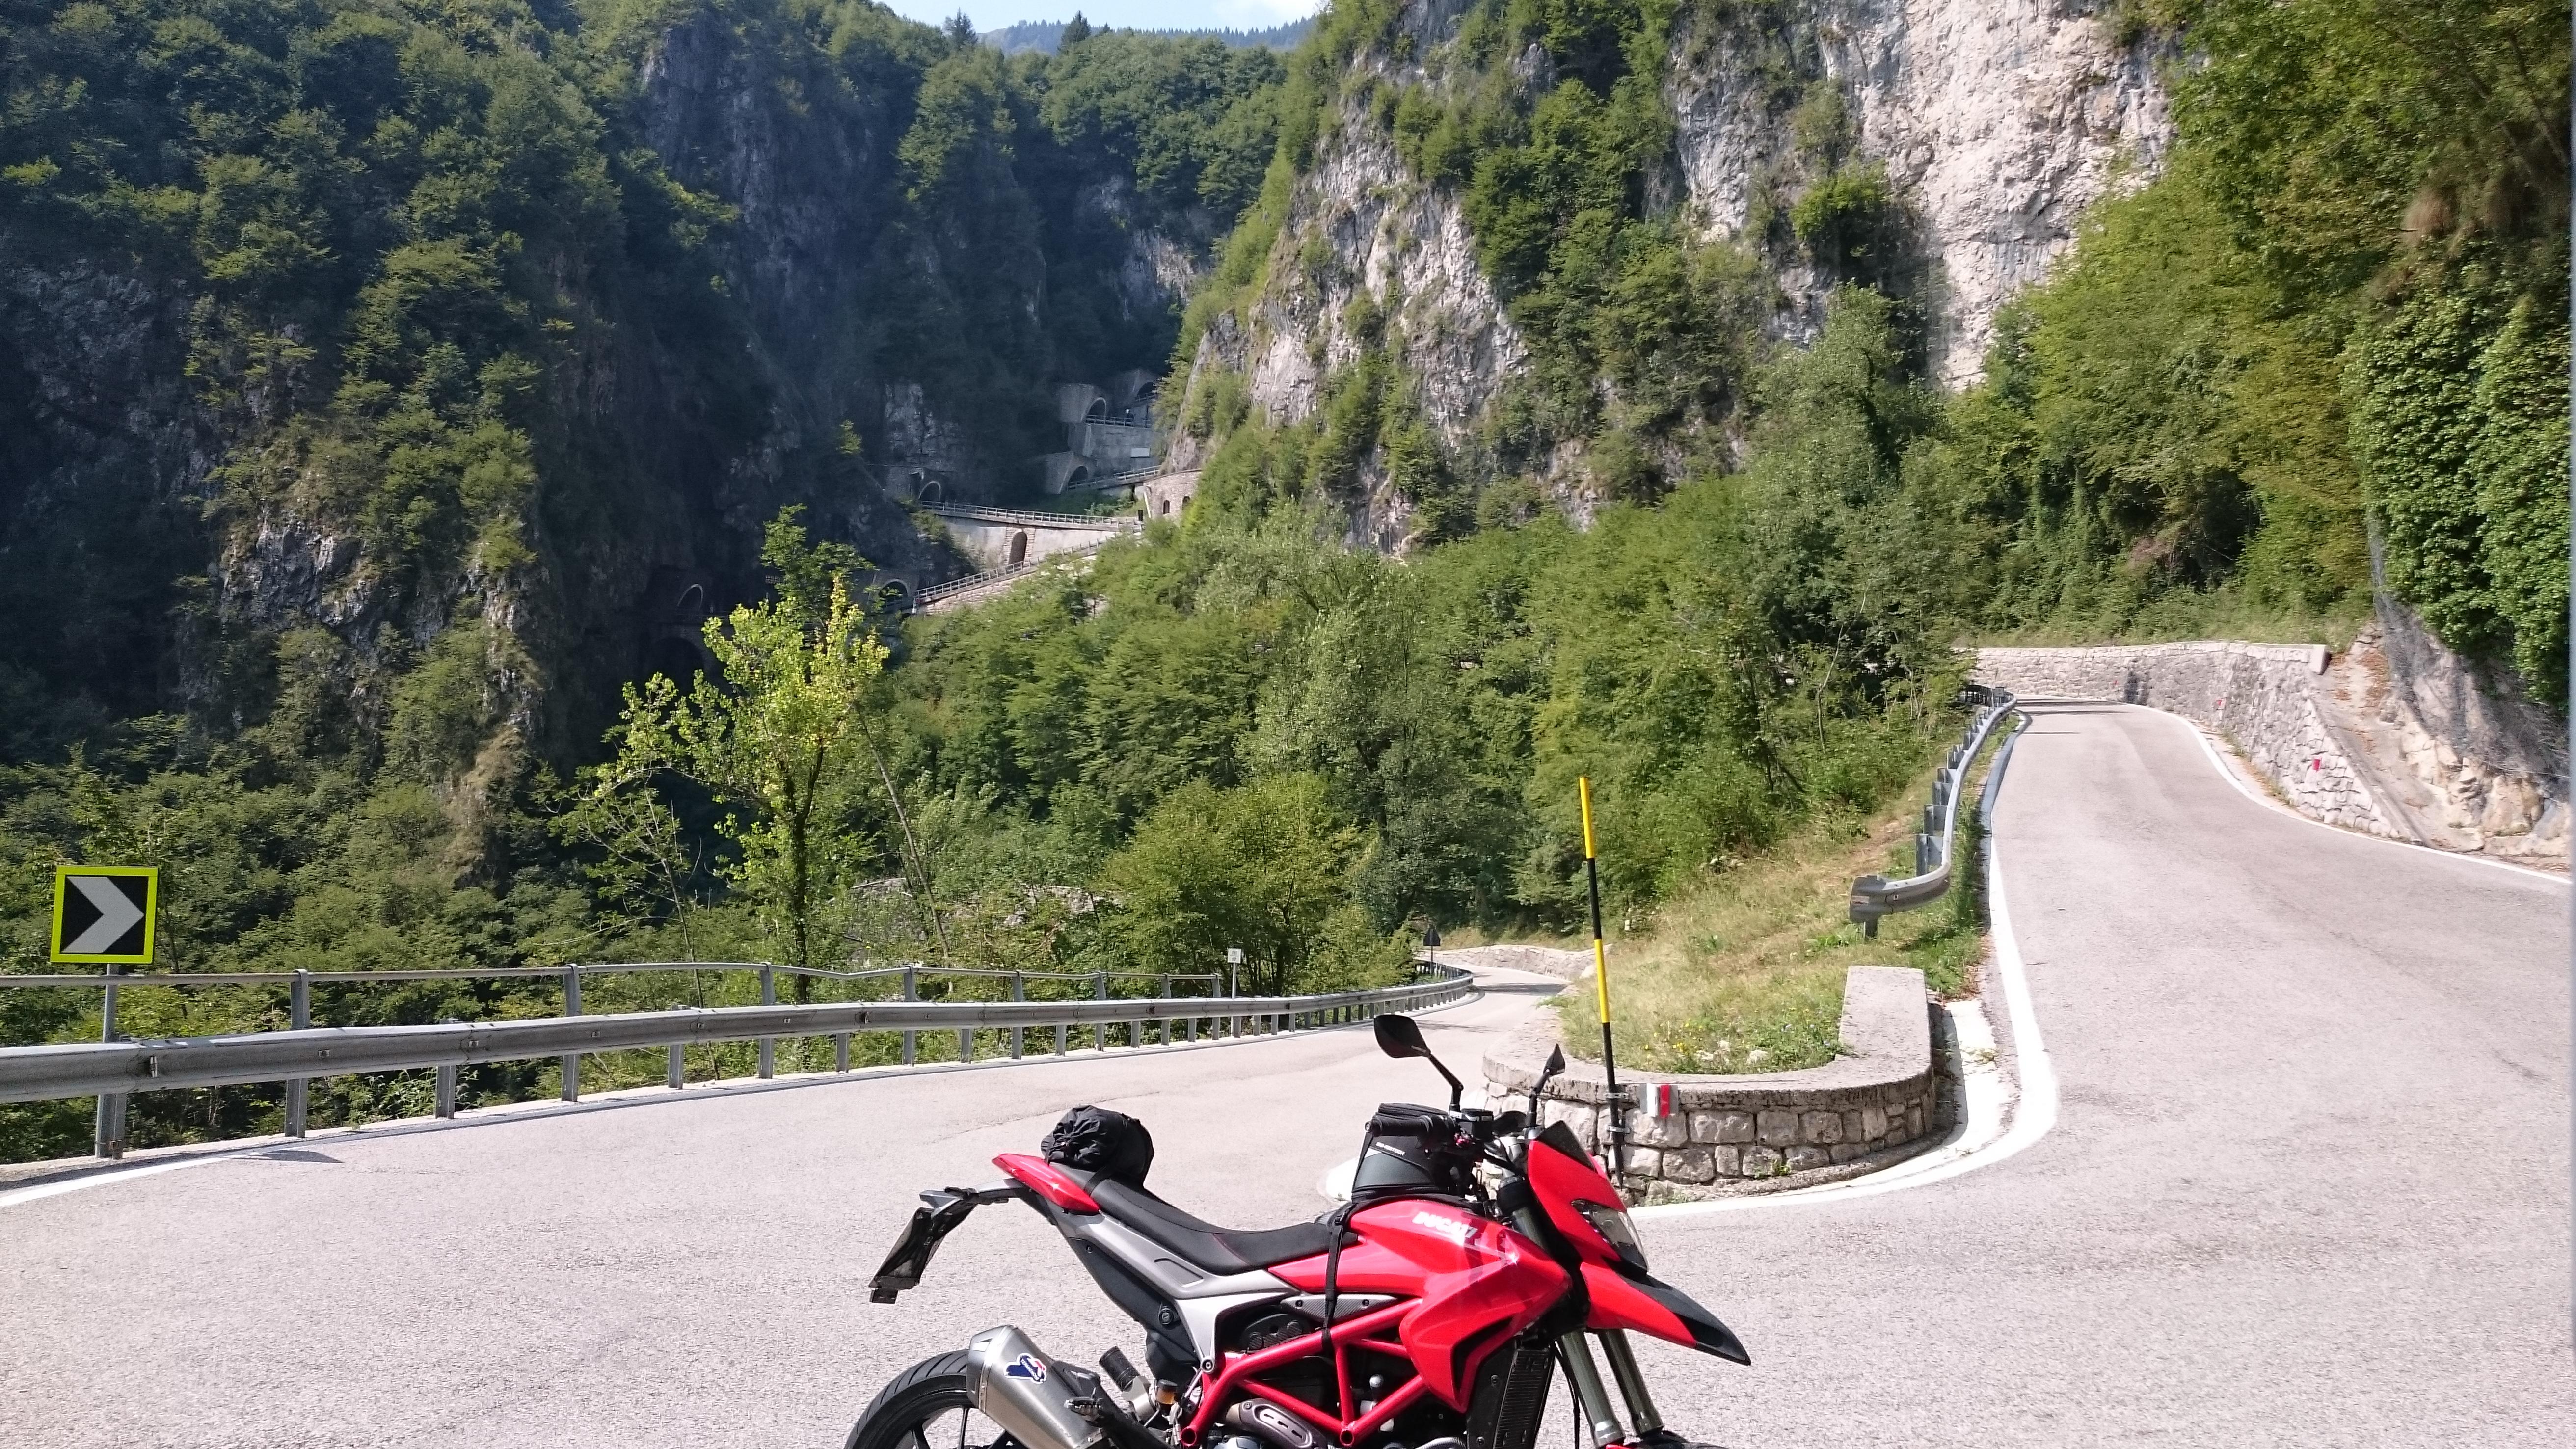 Martin S Content Page 8 Ducati1 Forum Fr Ducati Rennsport Und Hypermotard Fuse Box Dsc 2489